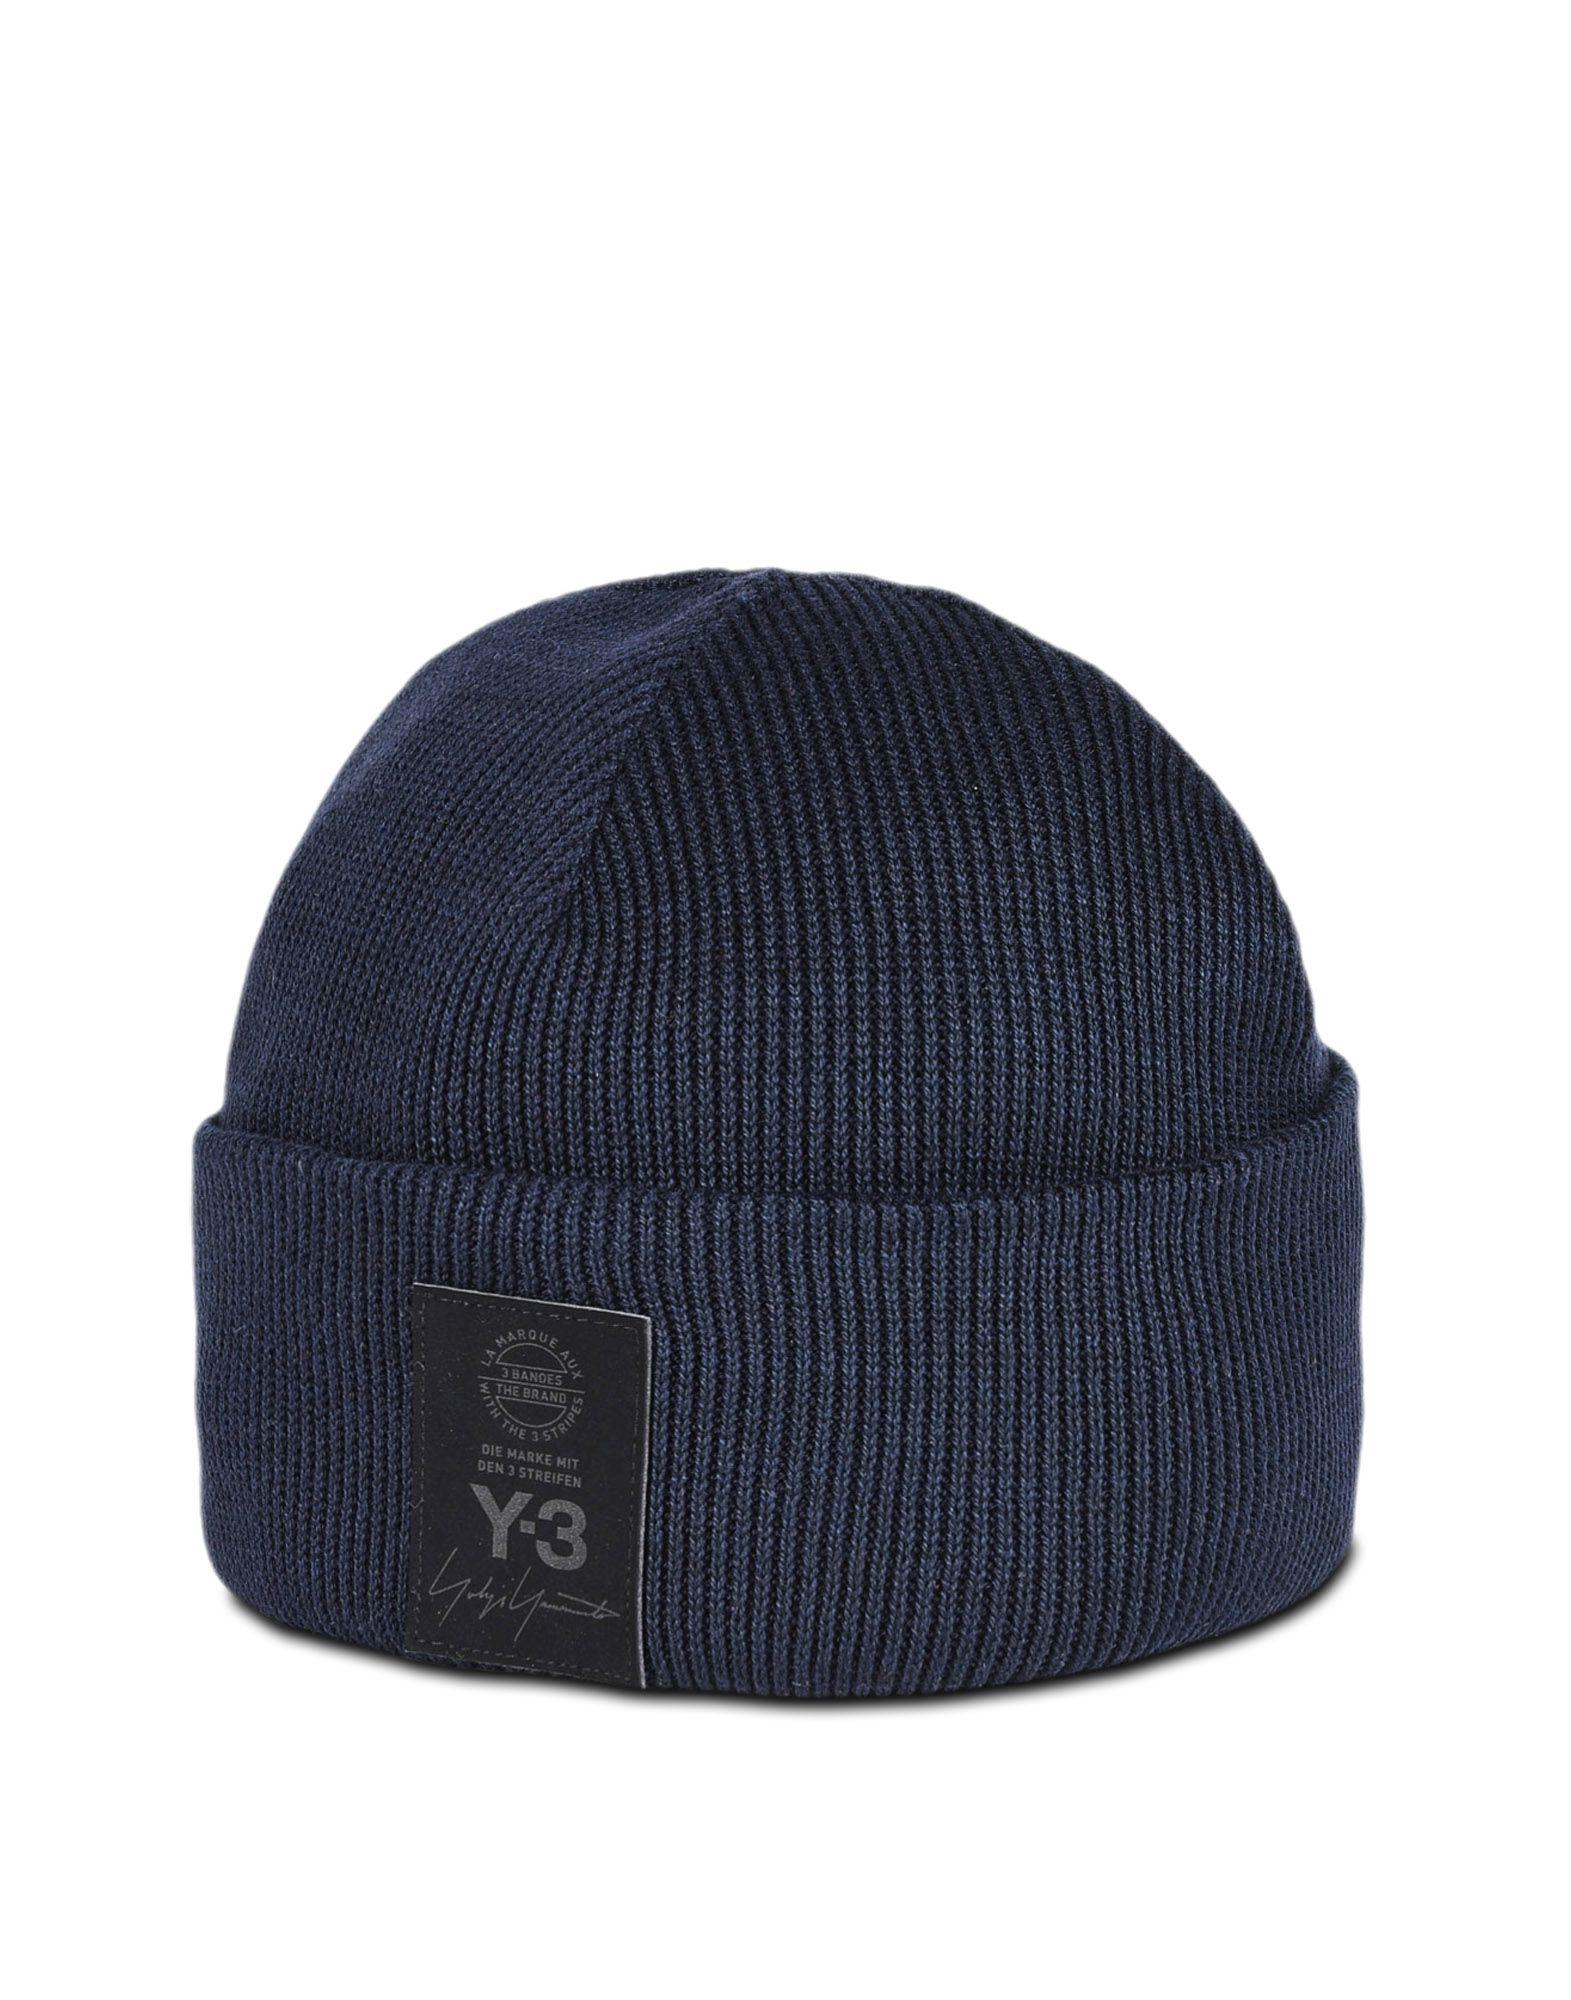 beanie hat - Red Yohji Yamamoto 0Jezr2bY